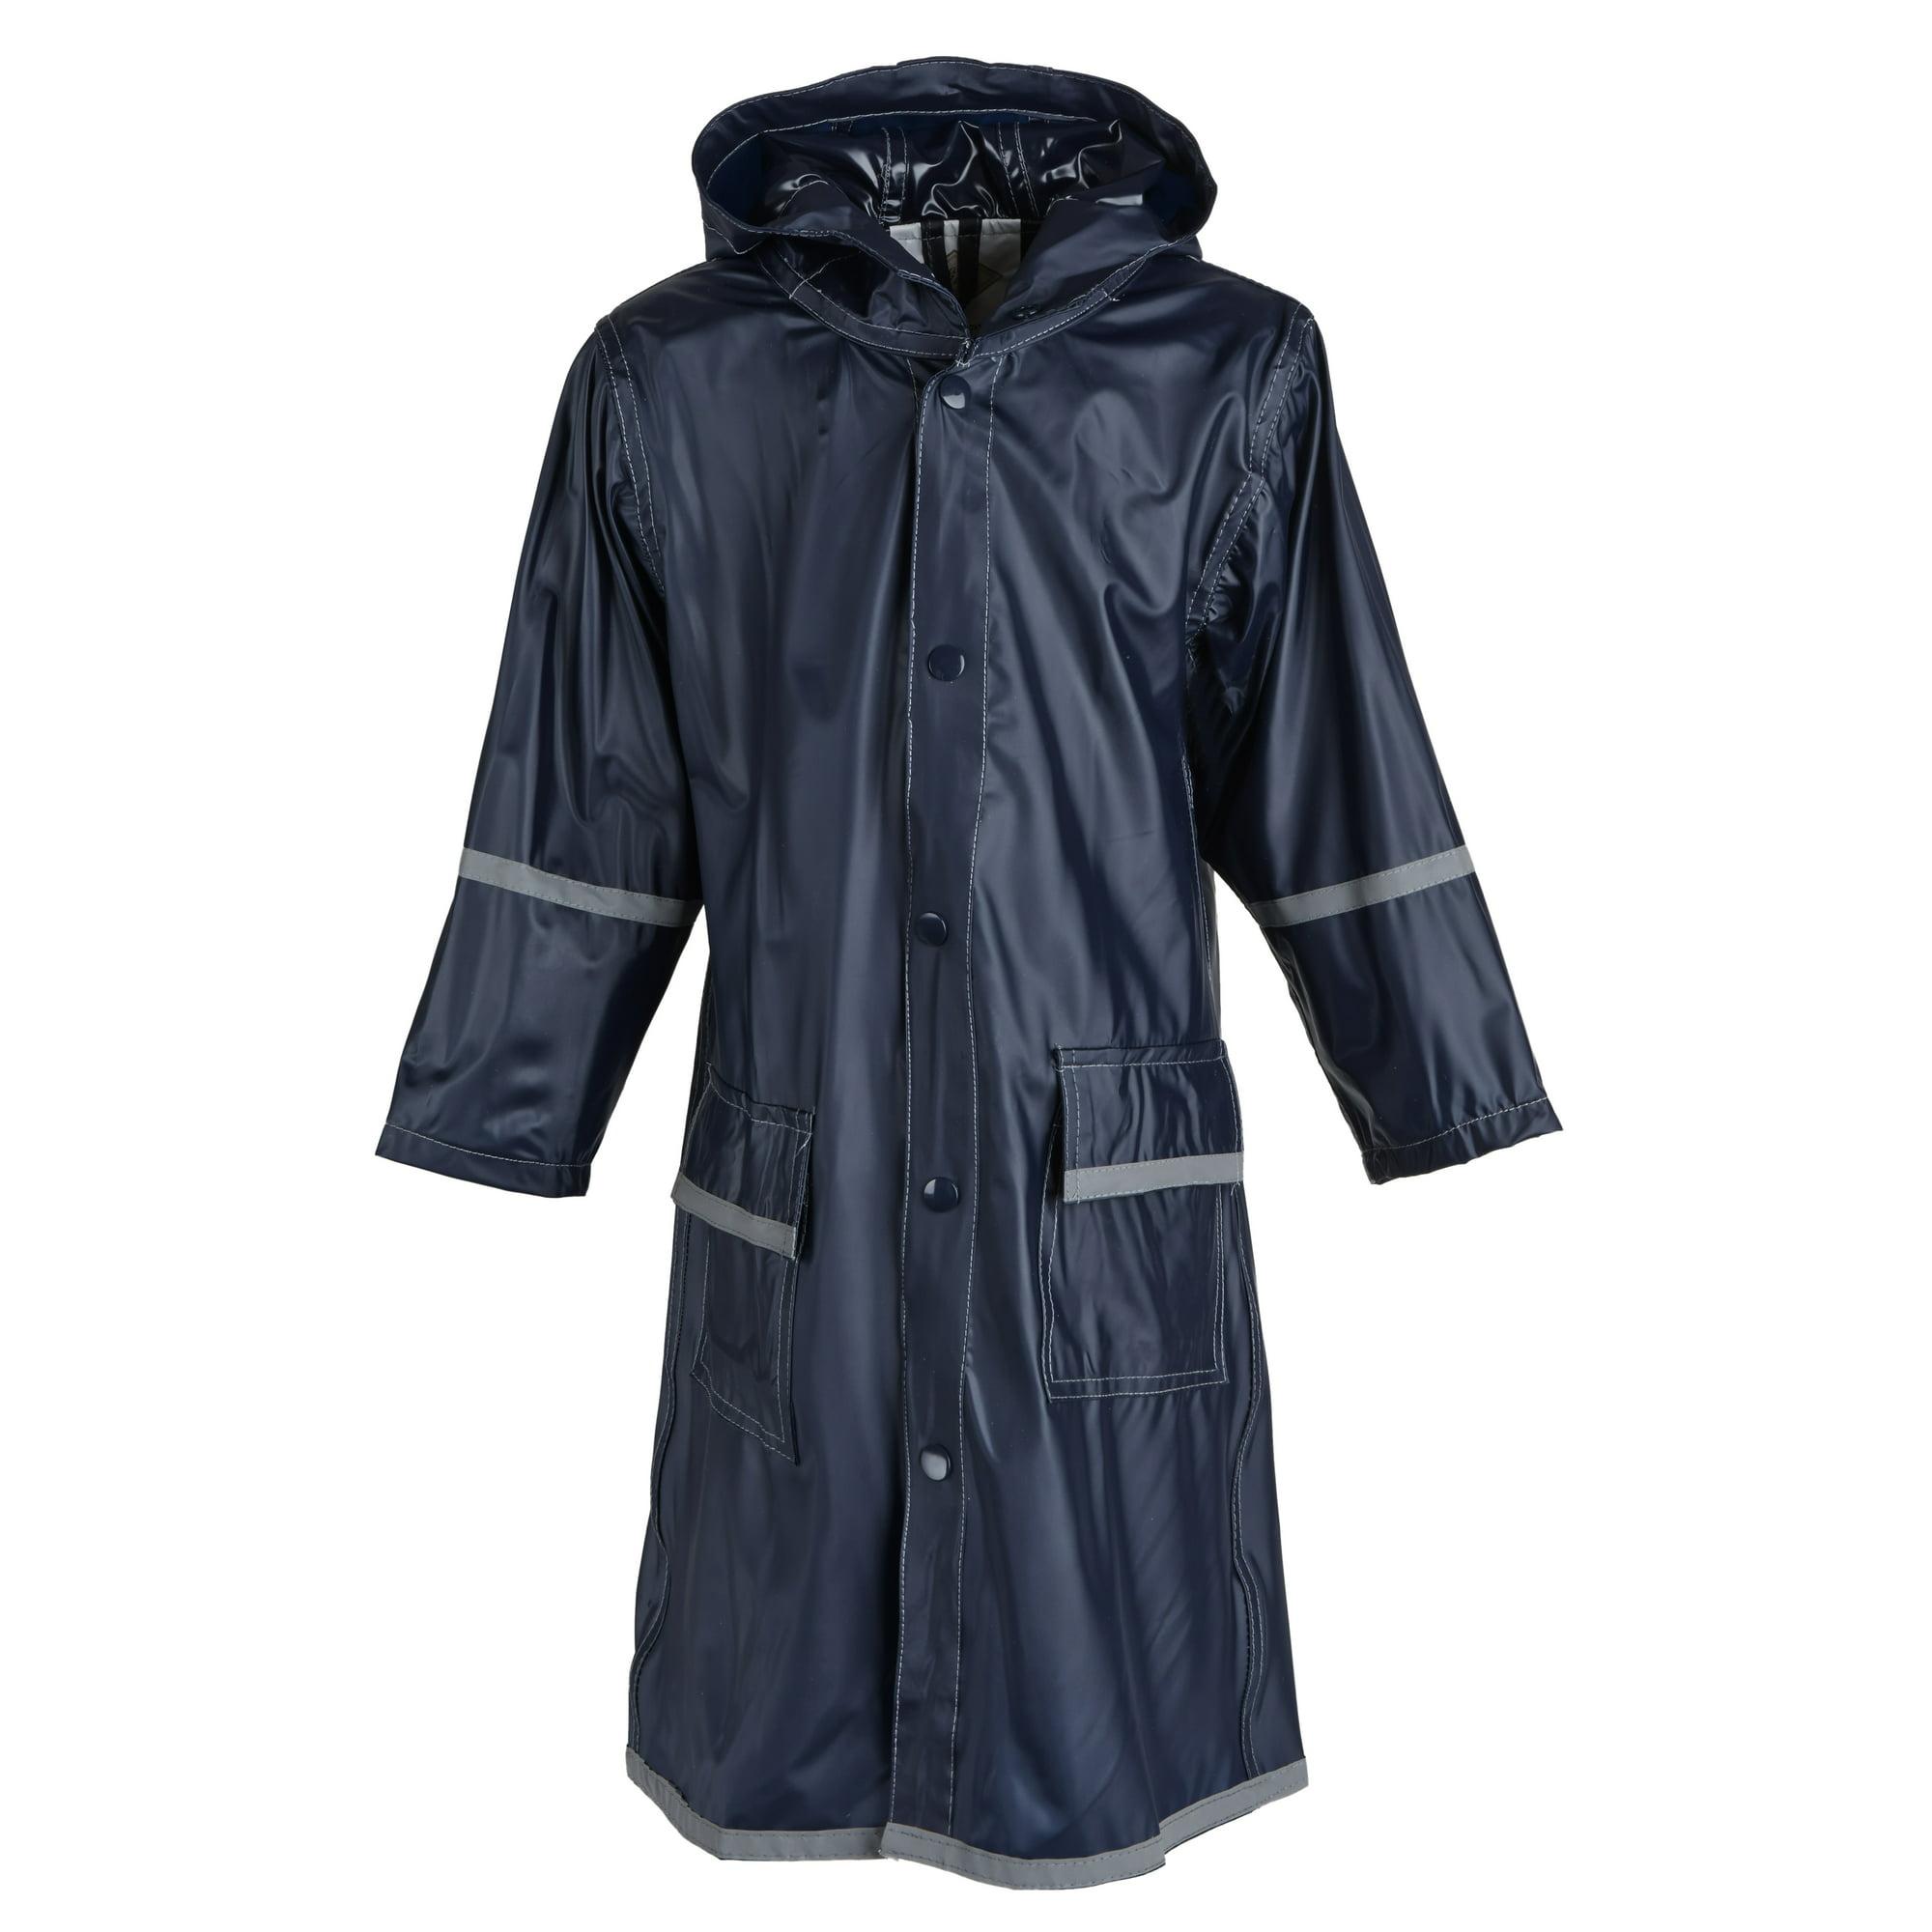 4708d5b95 Buy Girls Kids Waterproof Full Length Long Hooded Raincoat Jacket ...